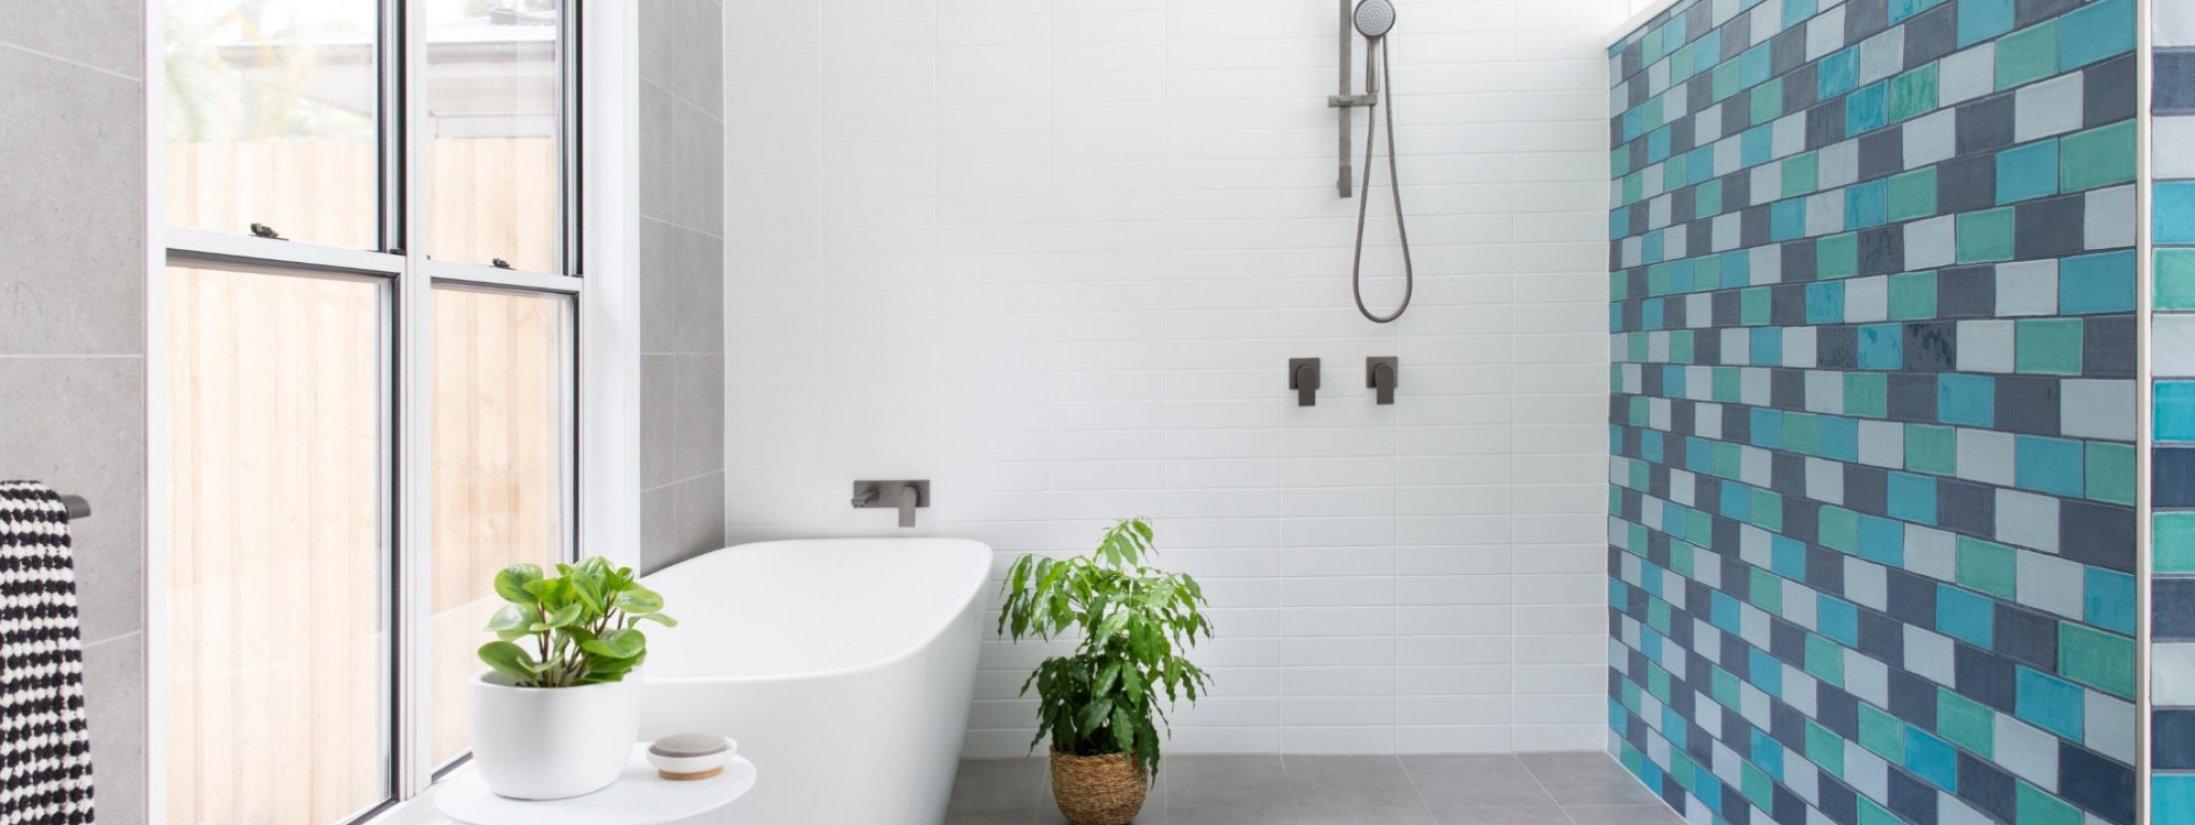 Barrel and Branch - Byron Bay - master bedroom ensuite with bath